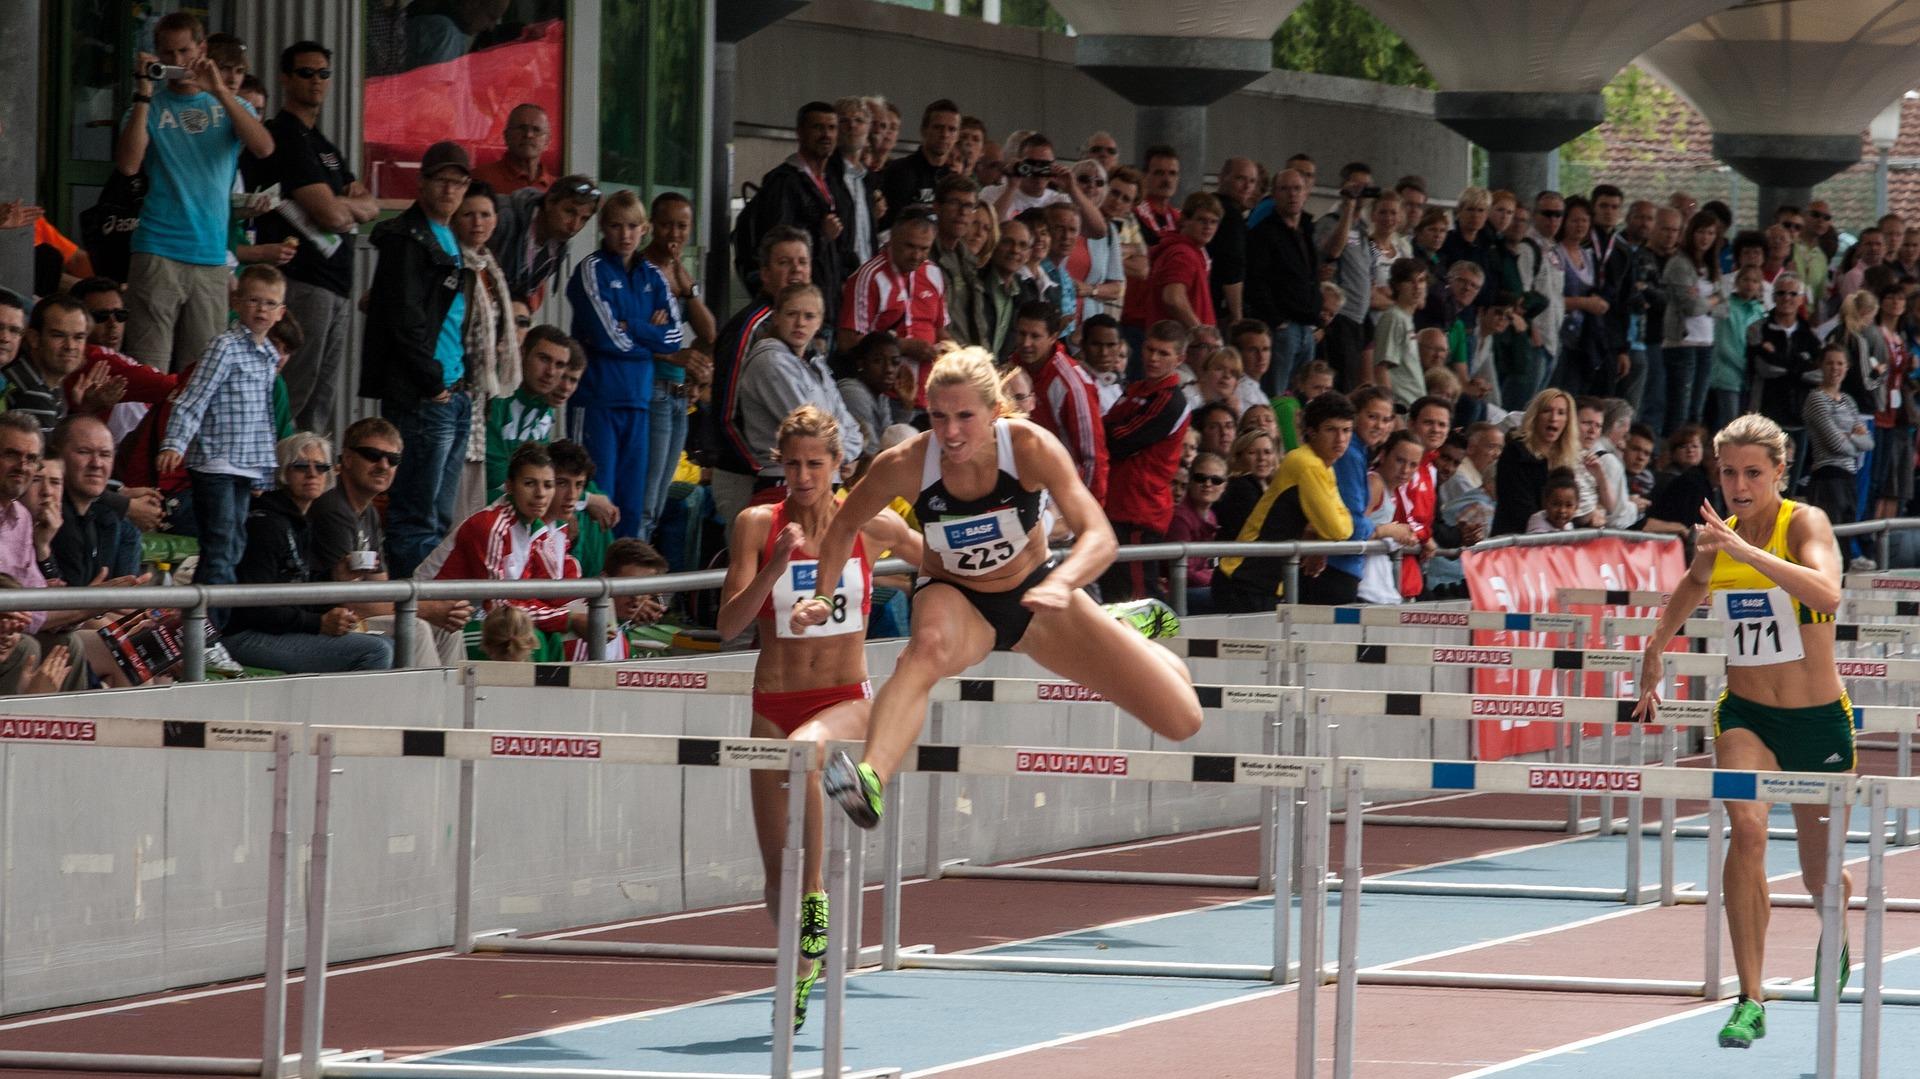 athletics-648040_1920.jpg